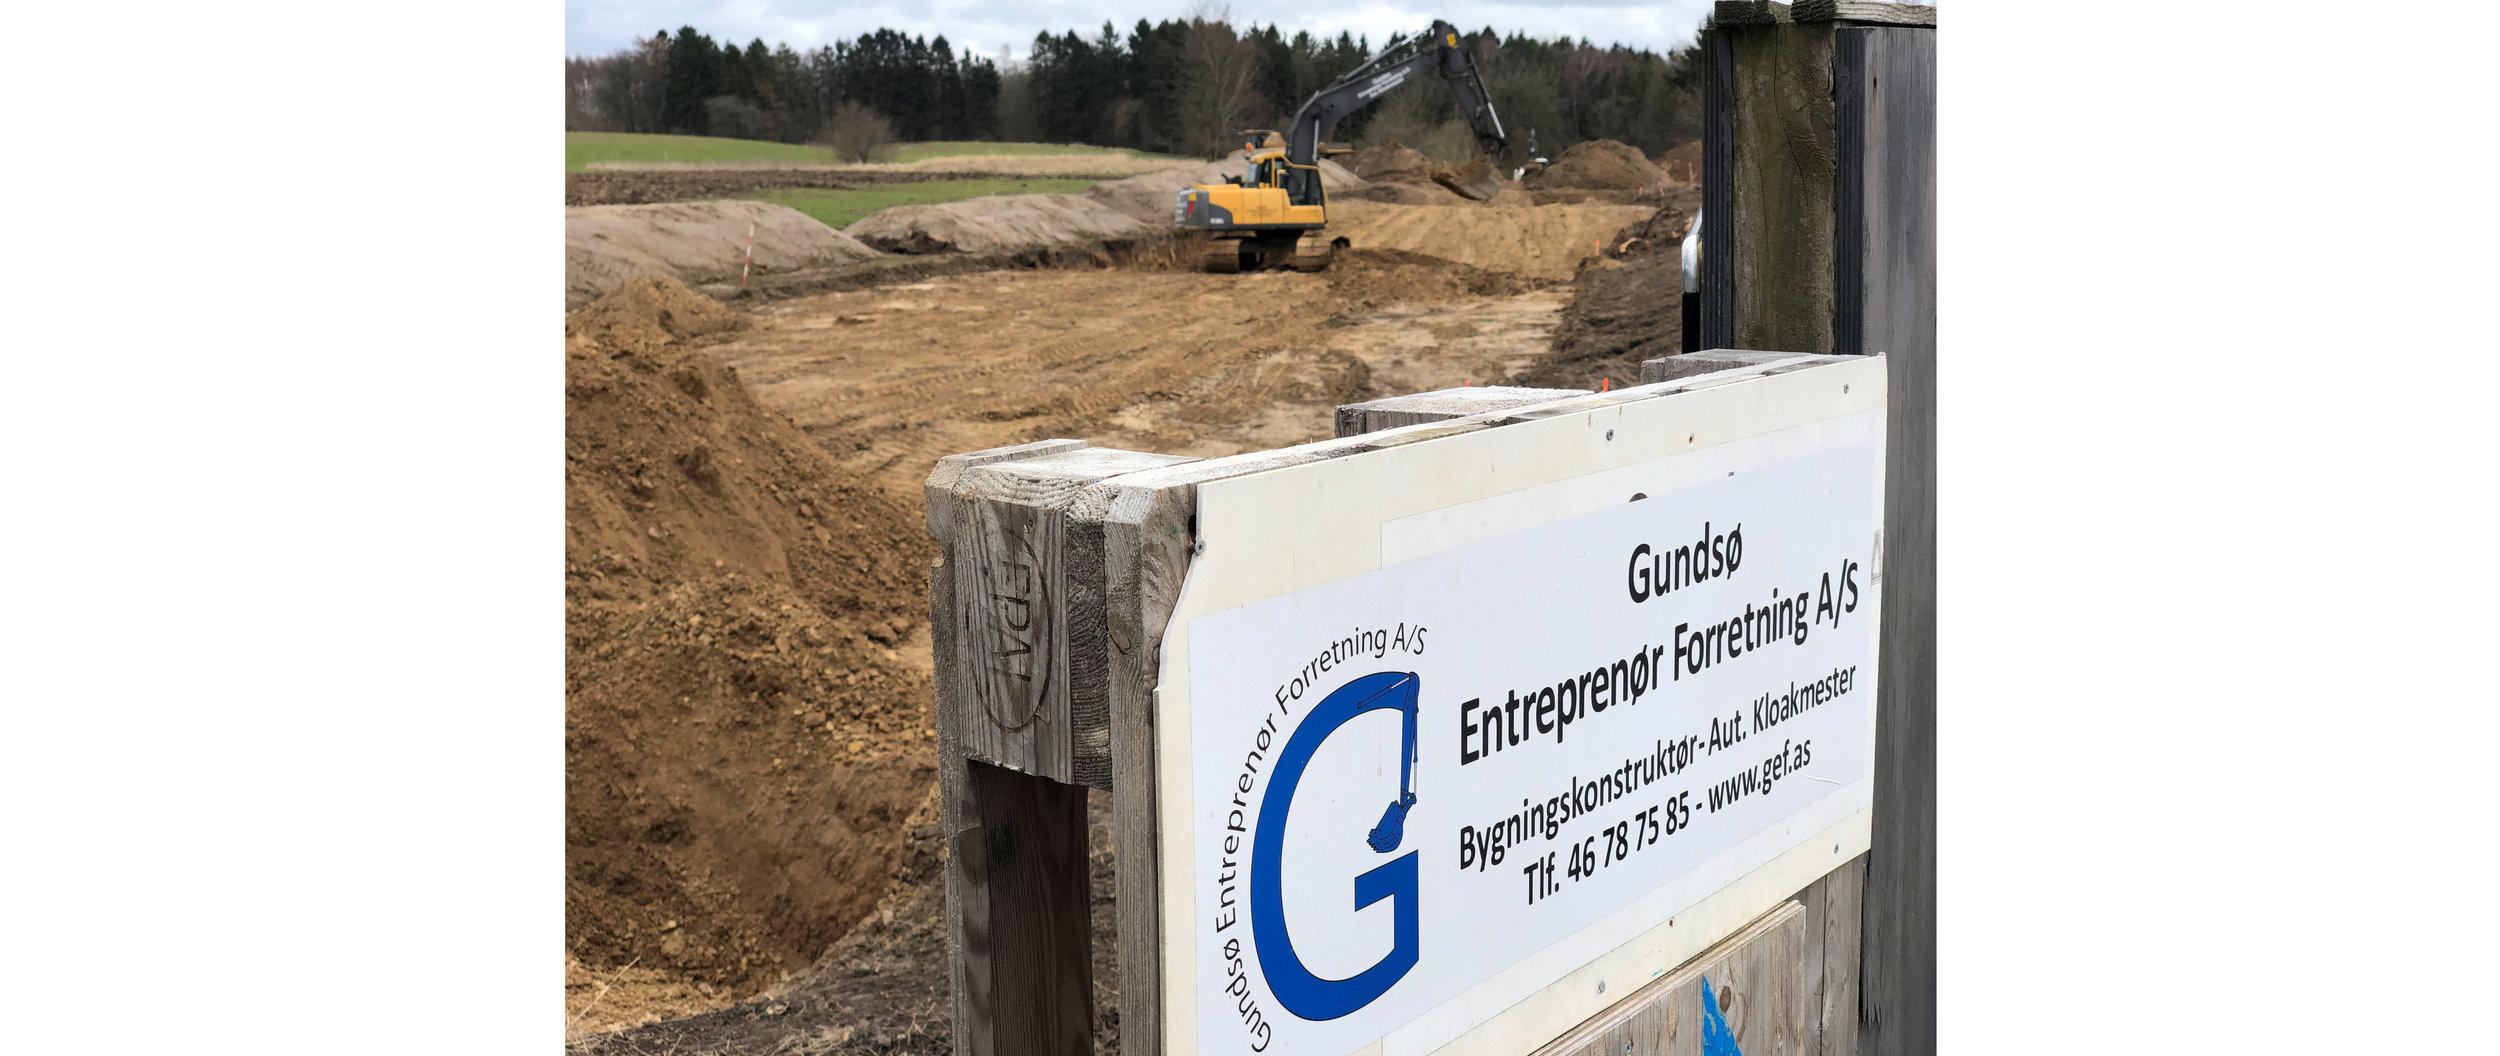 Det er 'Gundsø Entreprenør Forretning A/S', som står for entreprisen. Foto: AOB